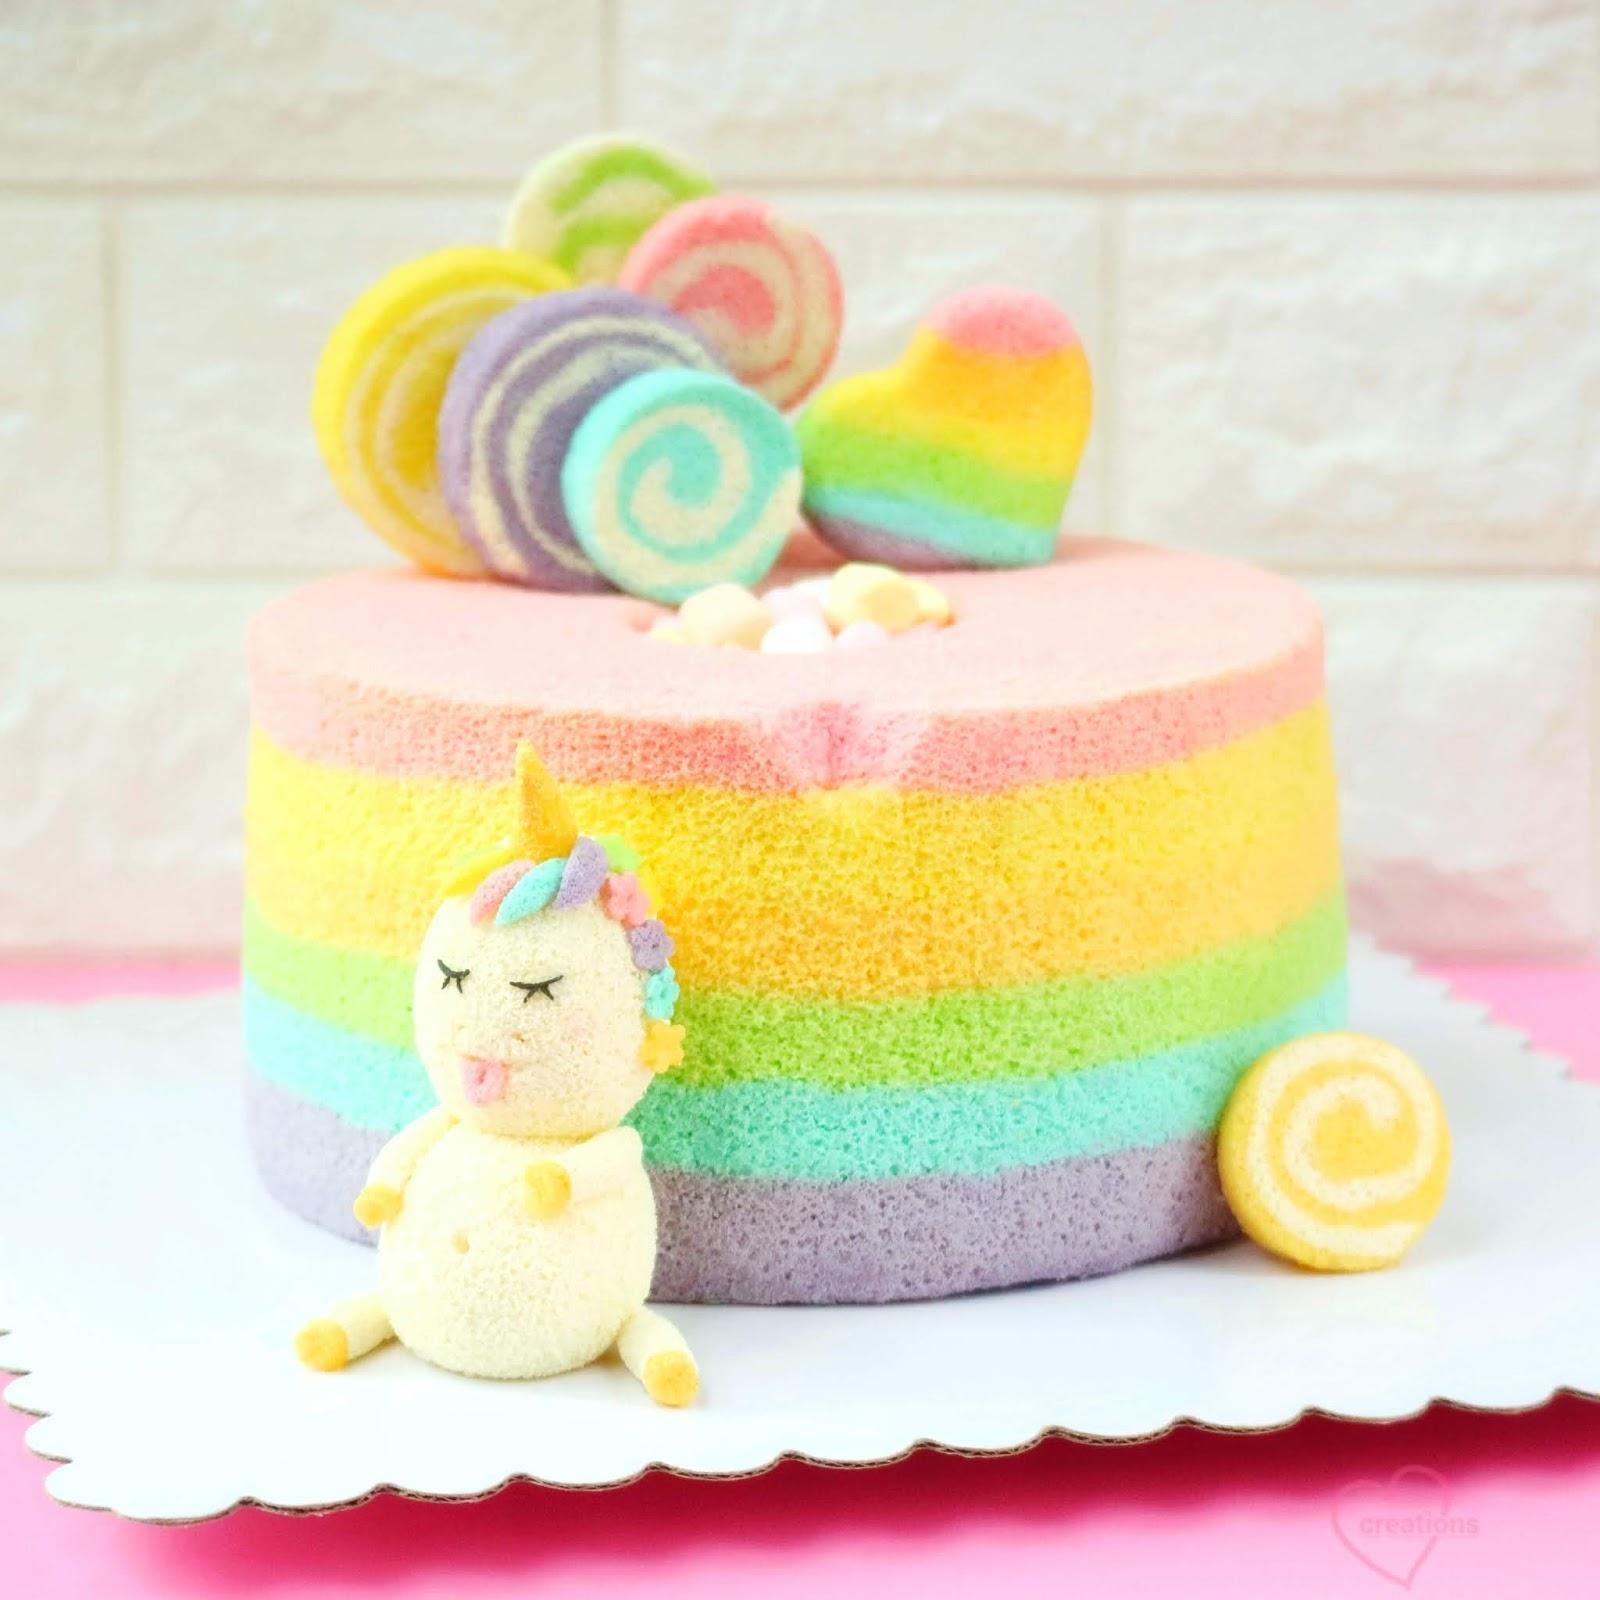 Loving Creations For You Fat Unicorn Rainbow Chiffon Cake